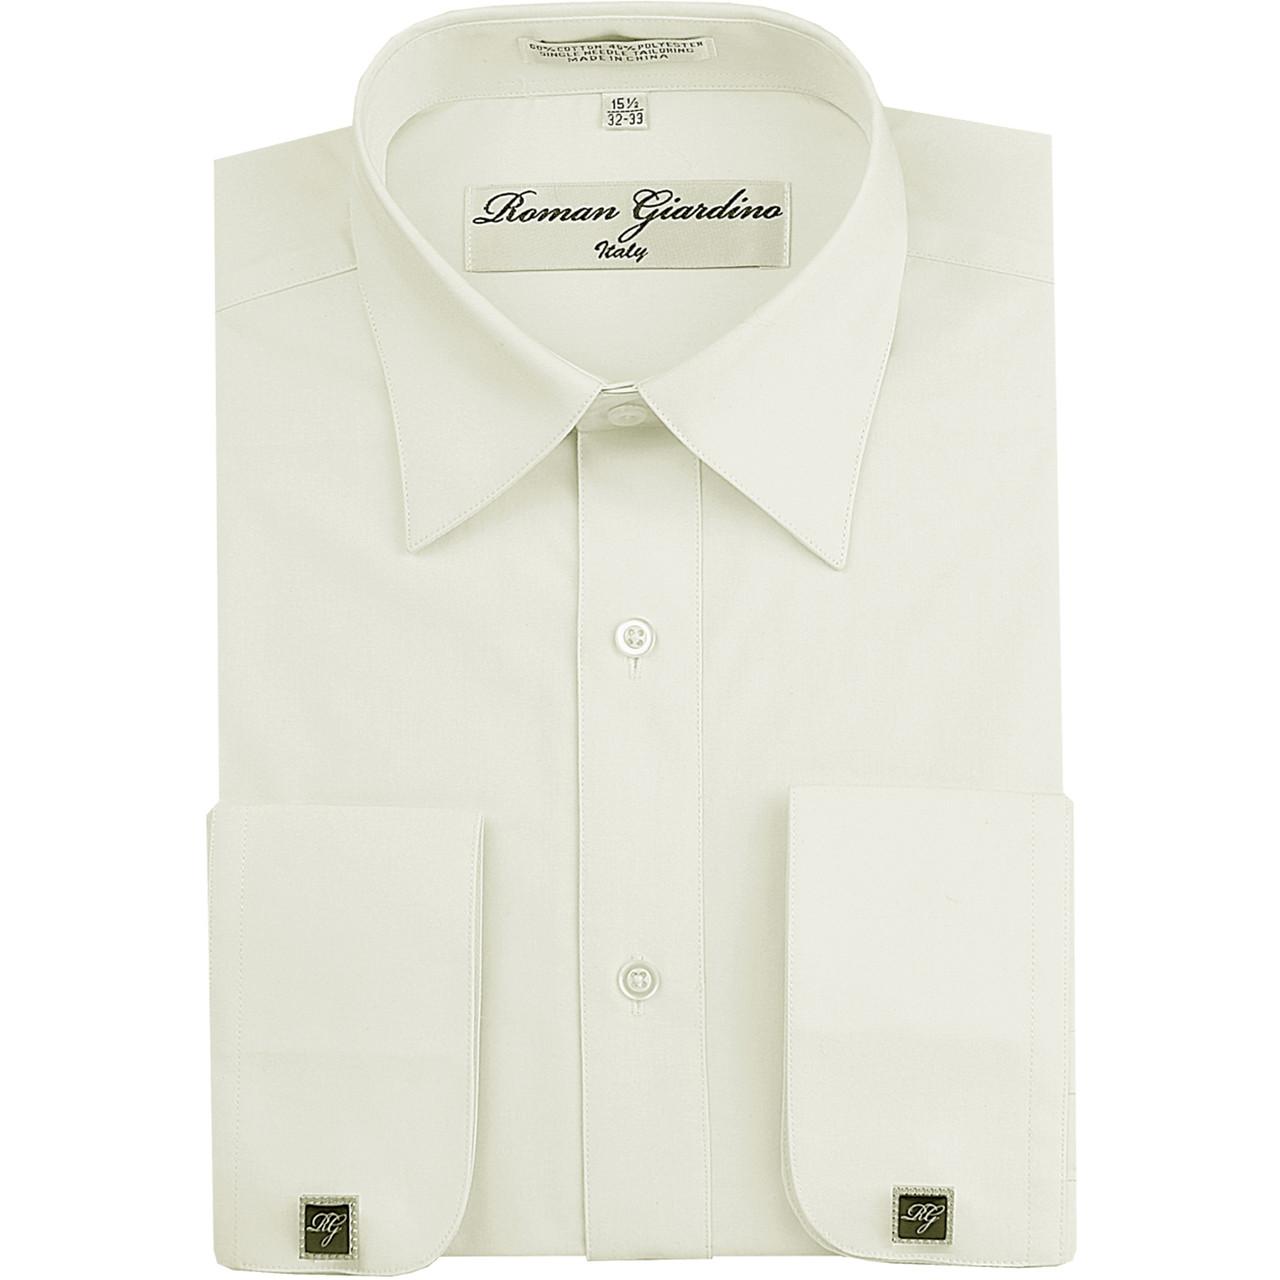 Mens Dress Shirt Free Cufflinks Embroidered Cuff Off White